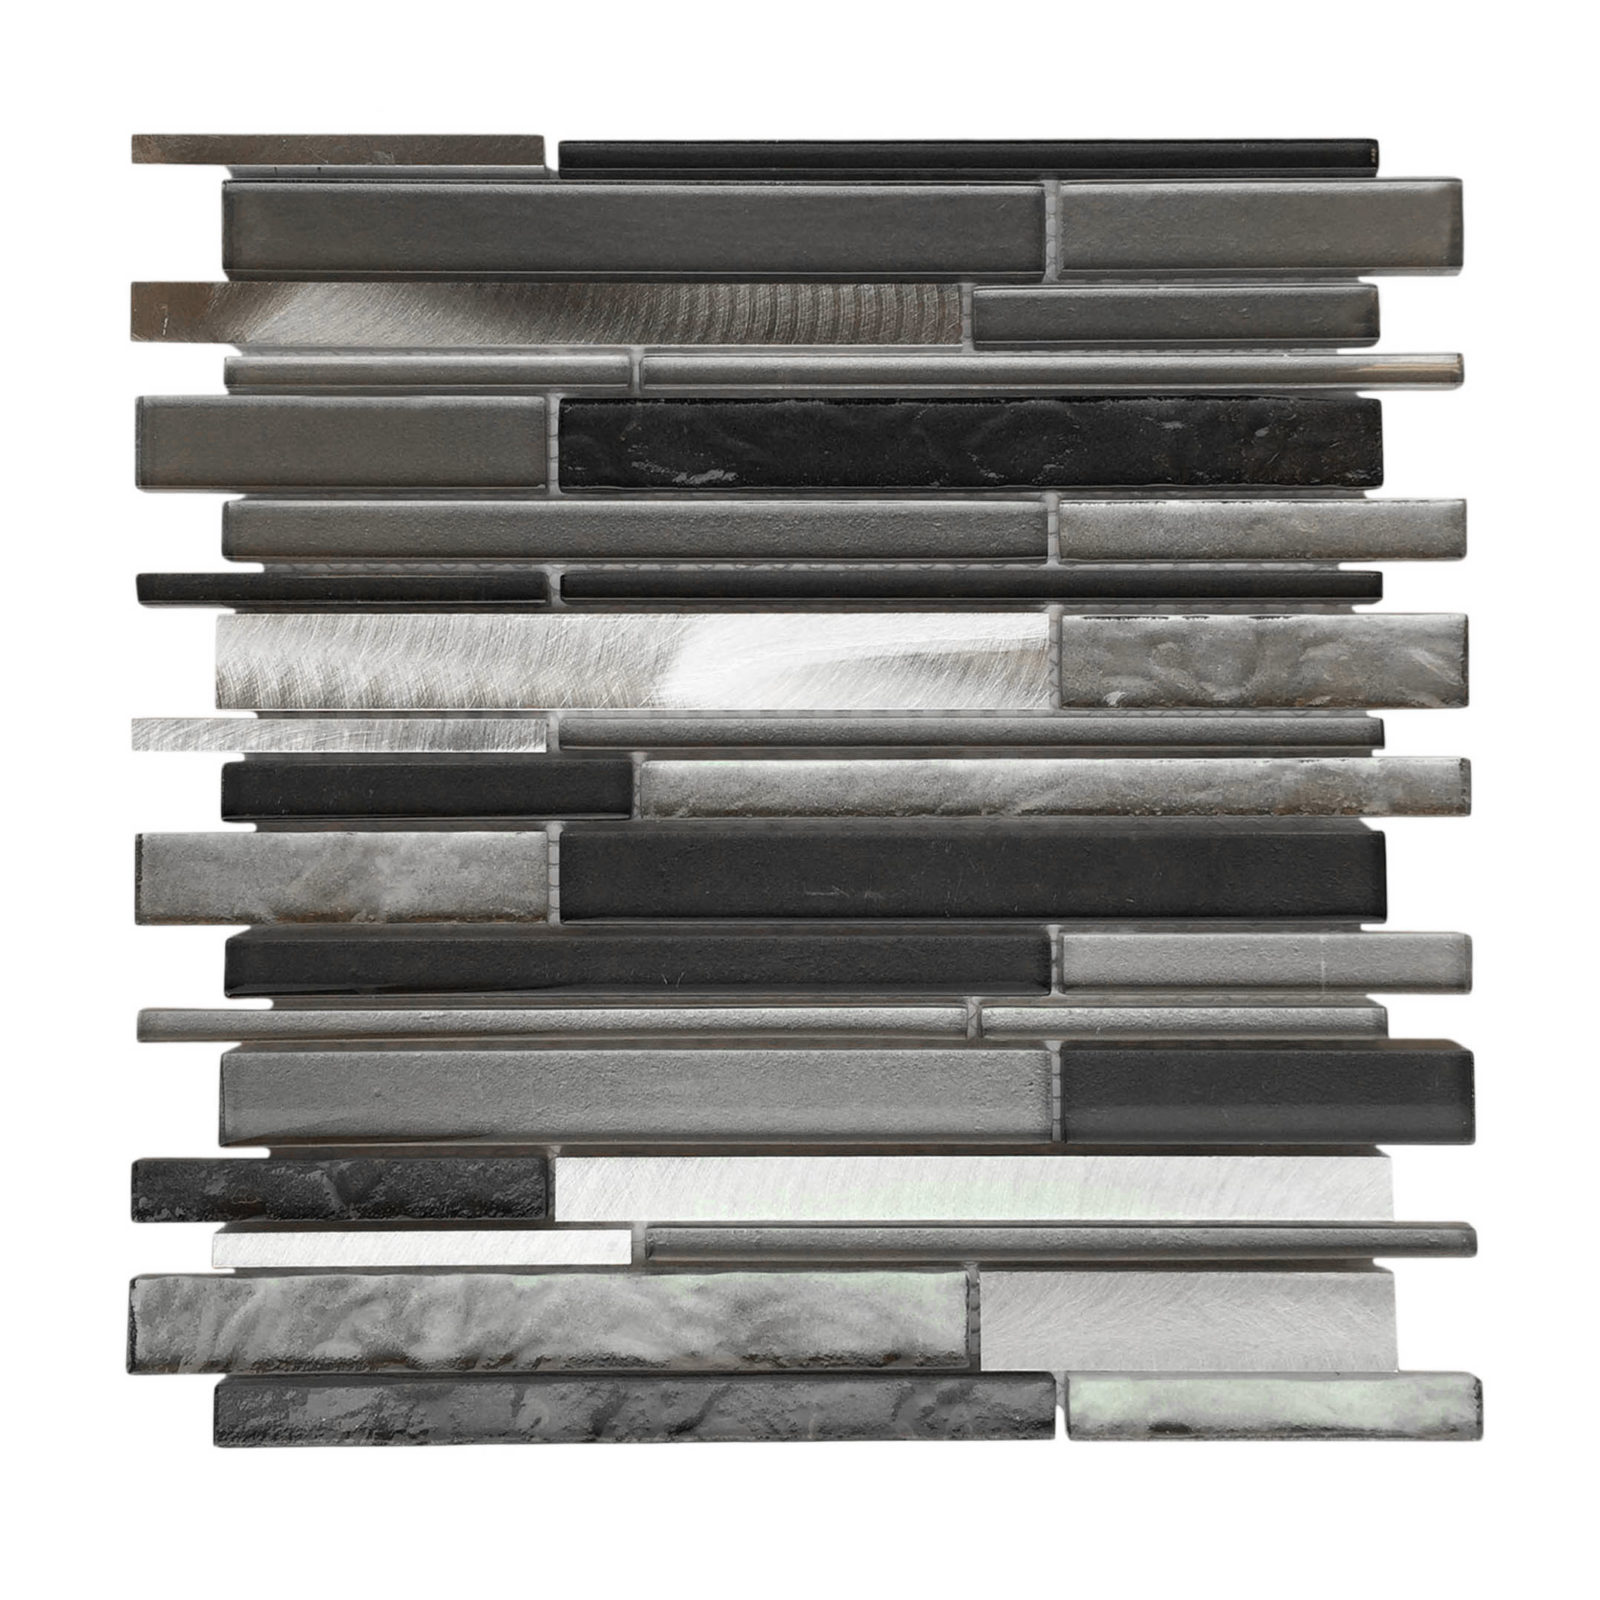 AL3200 Glass Tile and Stone, Strip Mosaic Backsplash